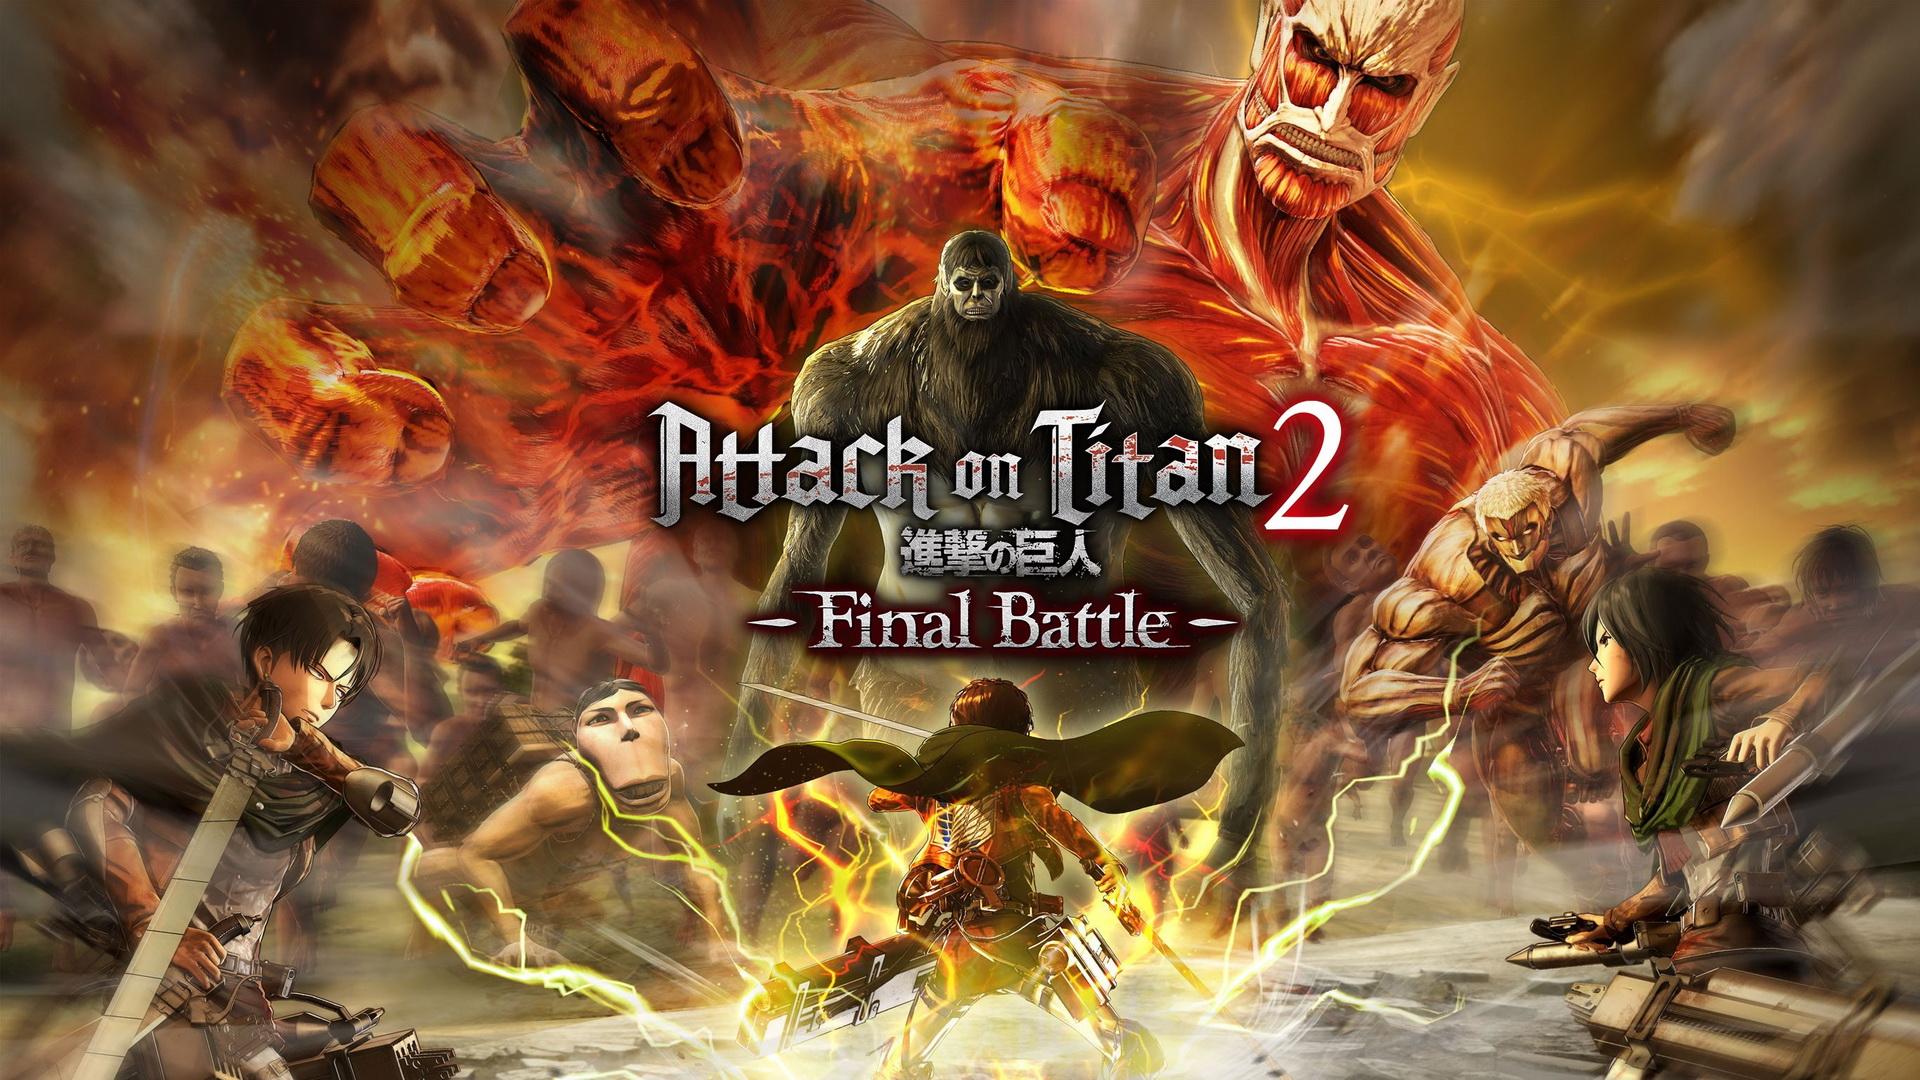 Atack on Titan 2